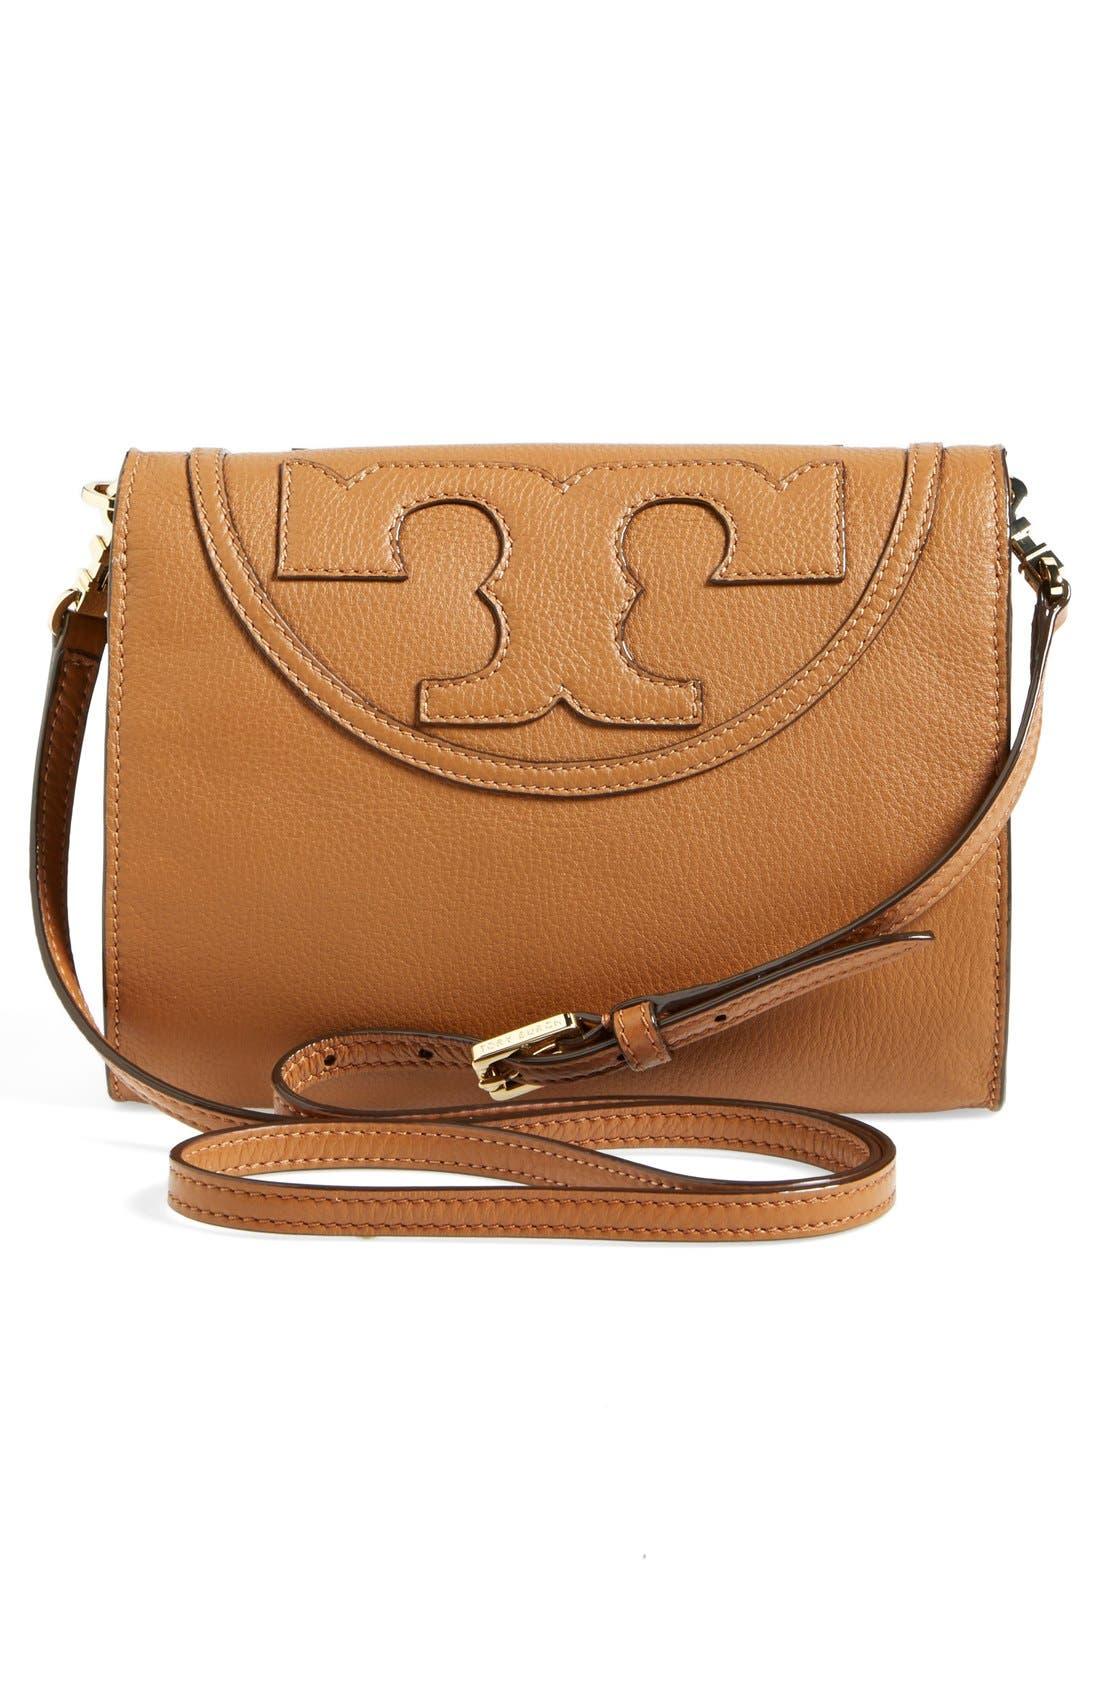 Alternate Image 3  - Tory Burch 'All-T' Leather Crossbody Bag